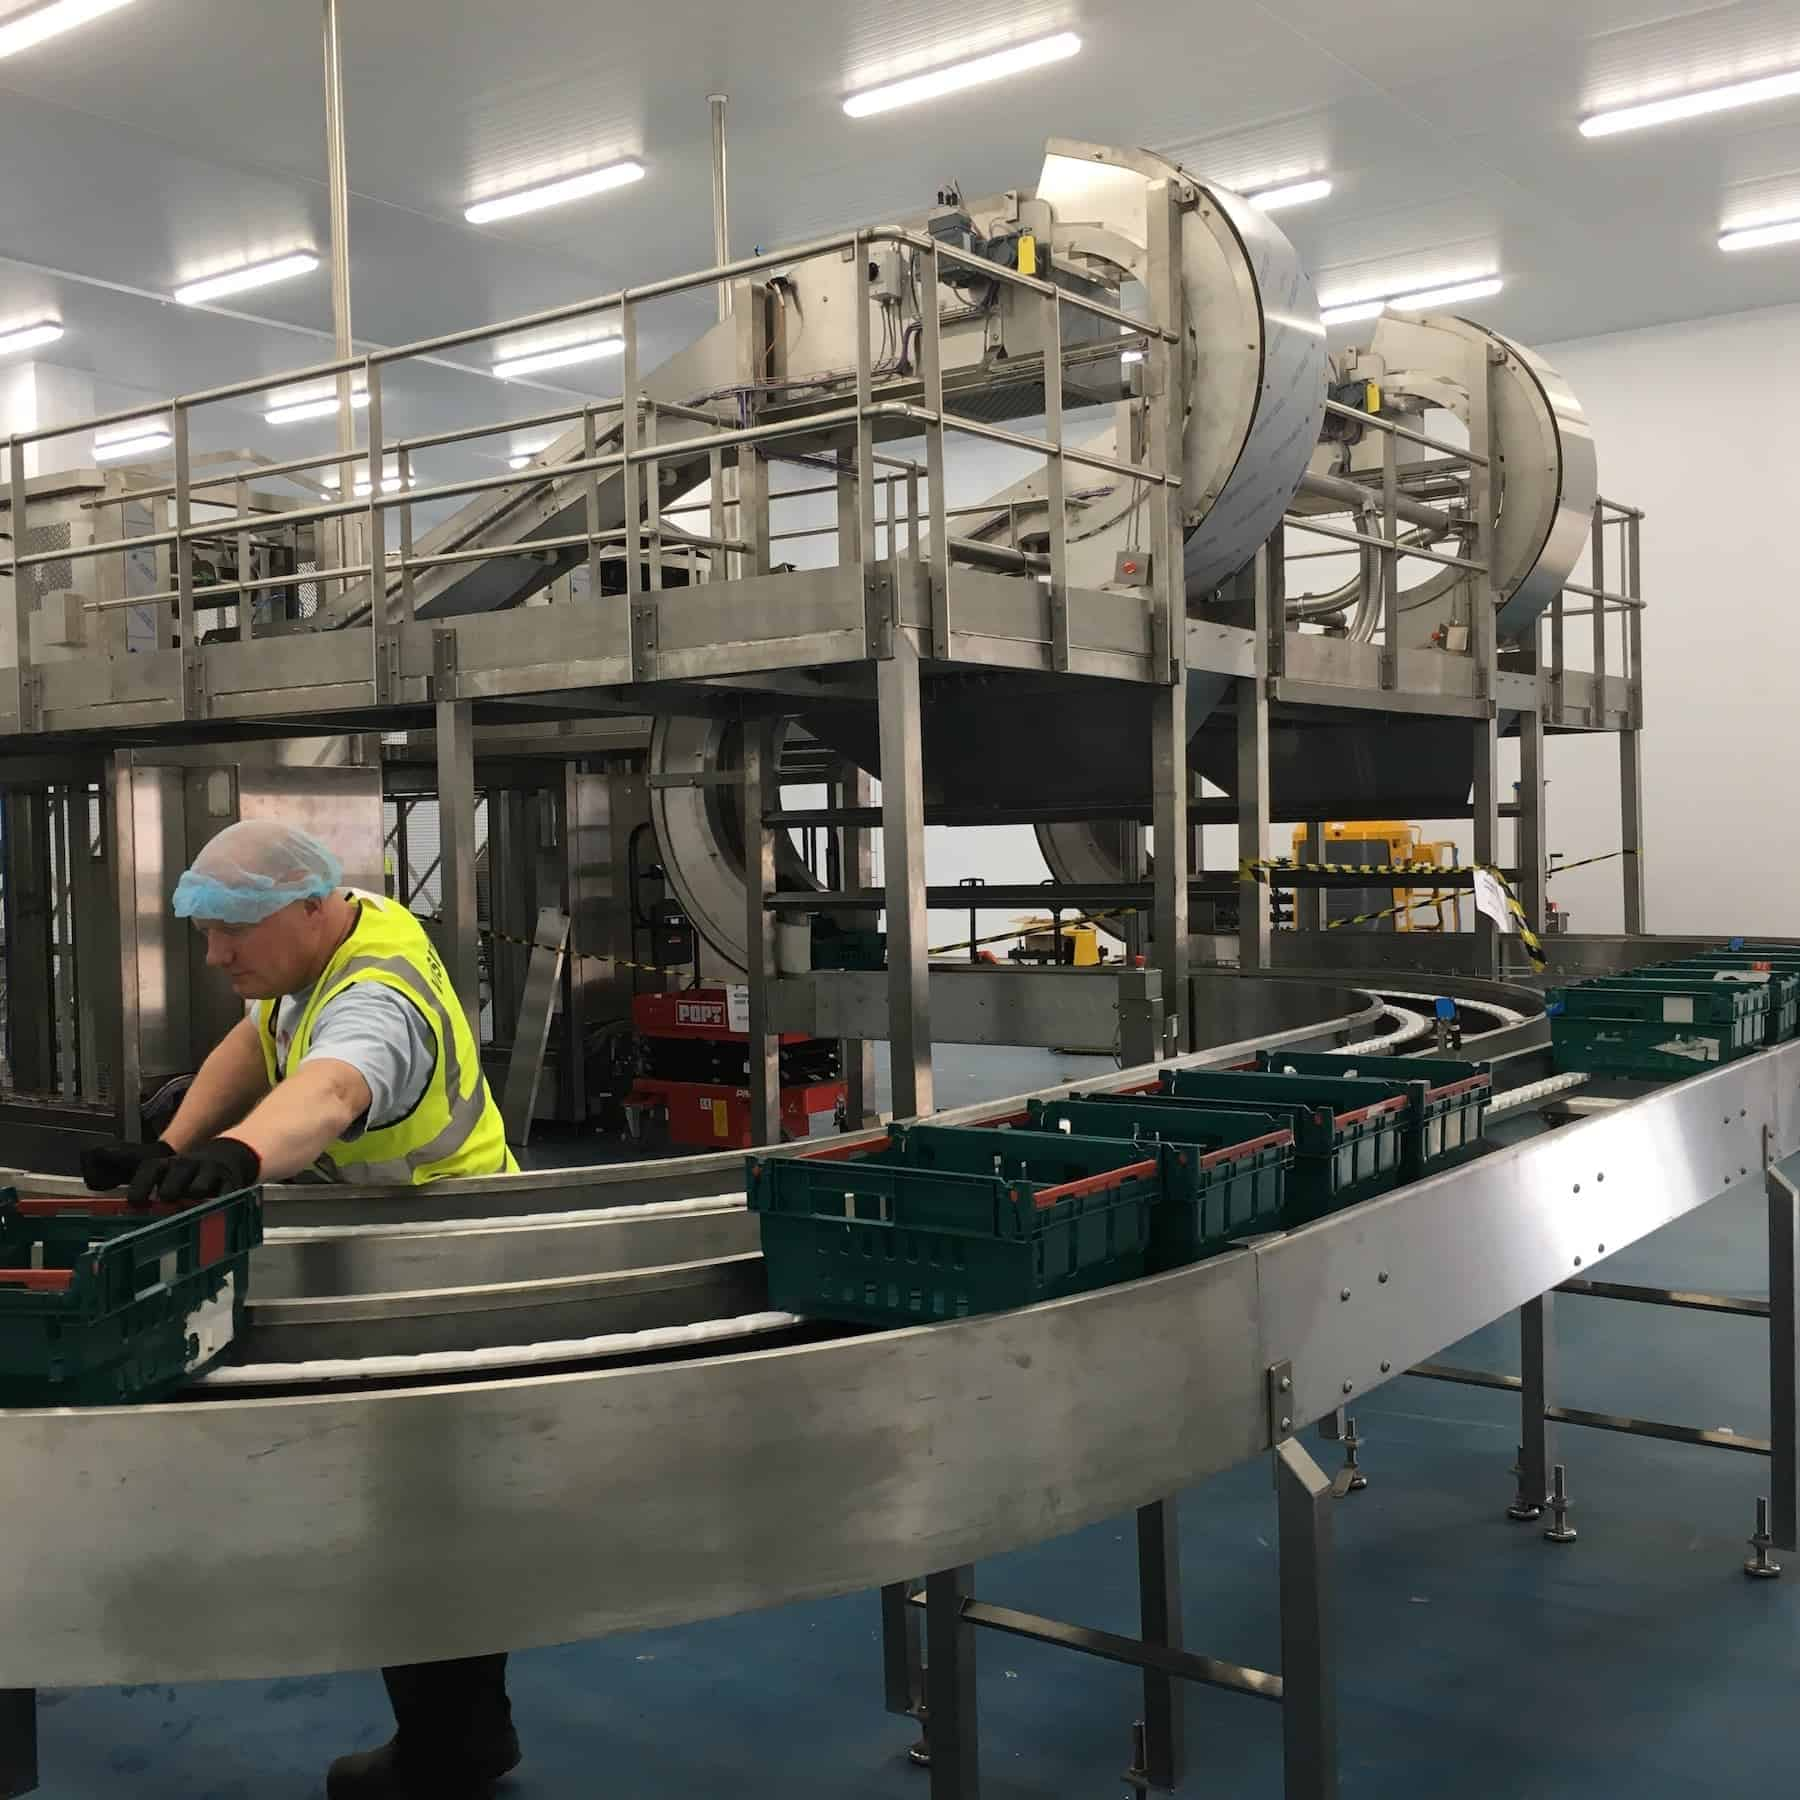 Speedy Tray Washing Machine For High-Volume Users